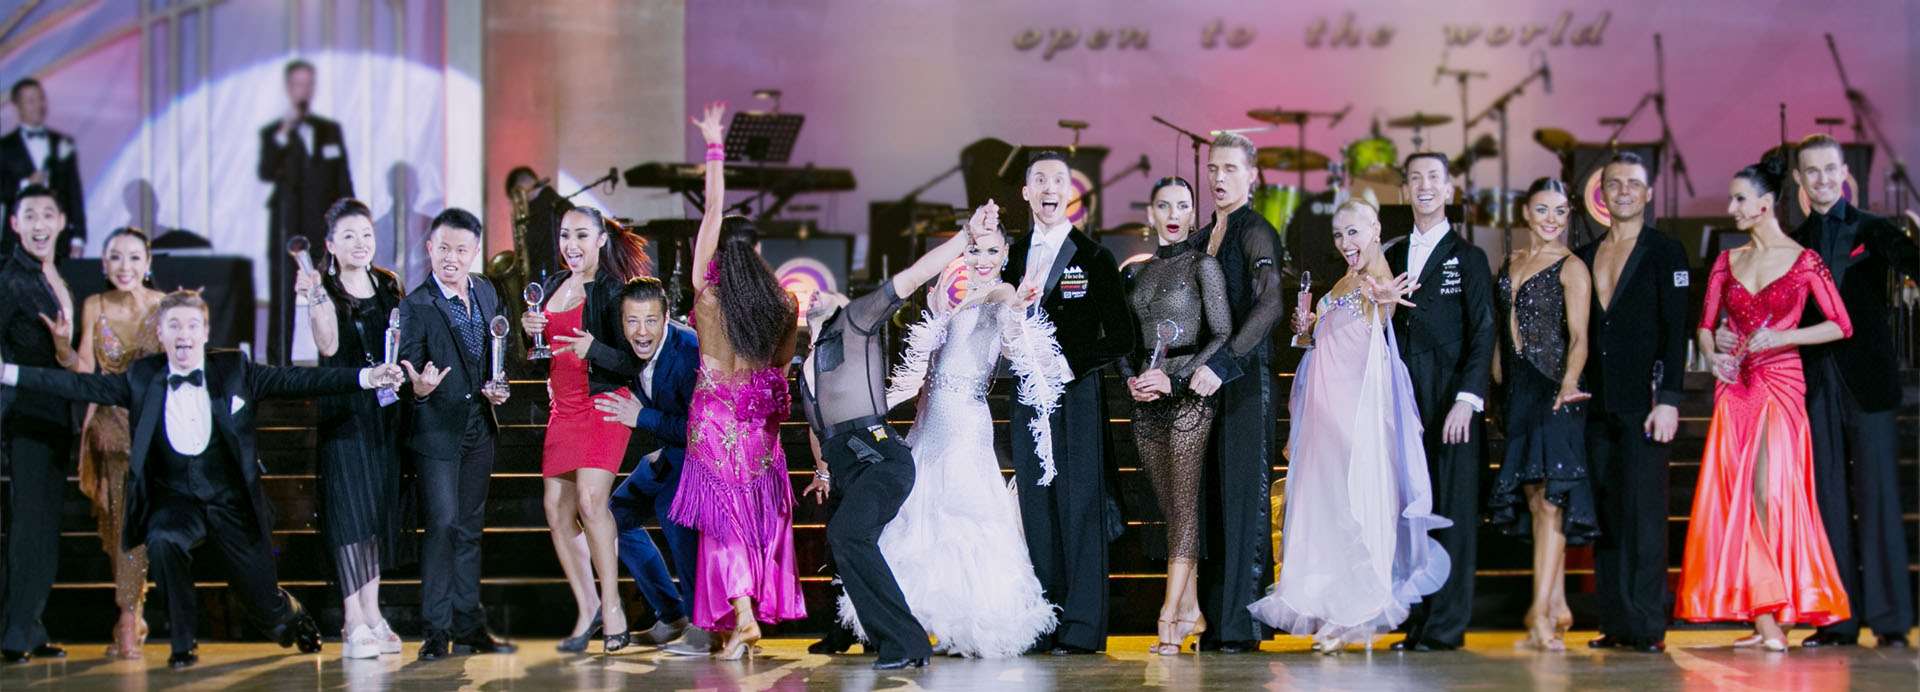 Blackpool Dance Festival · China